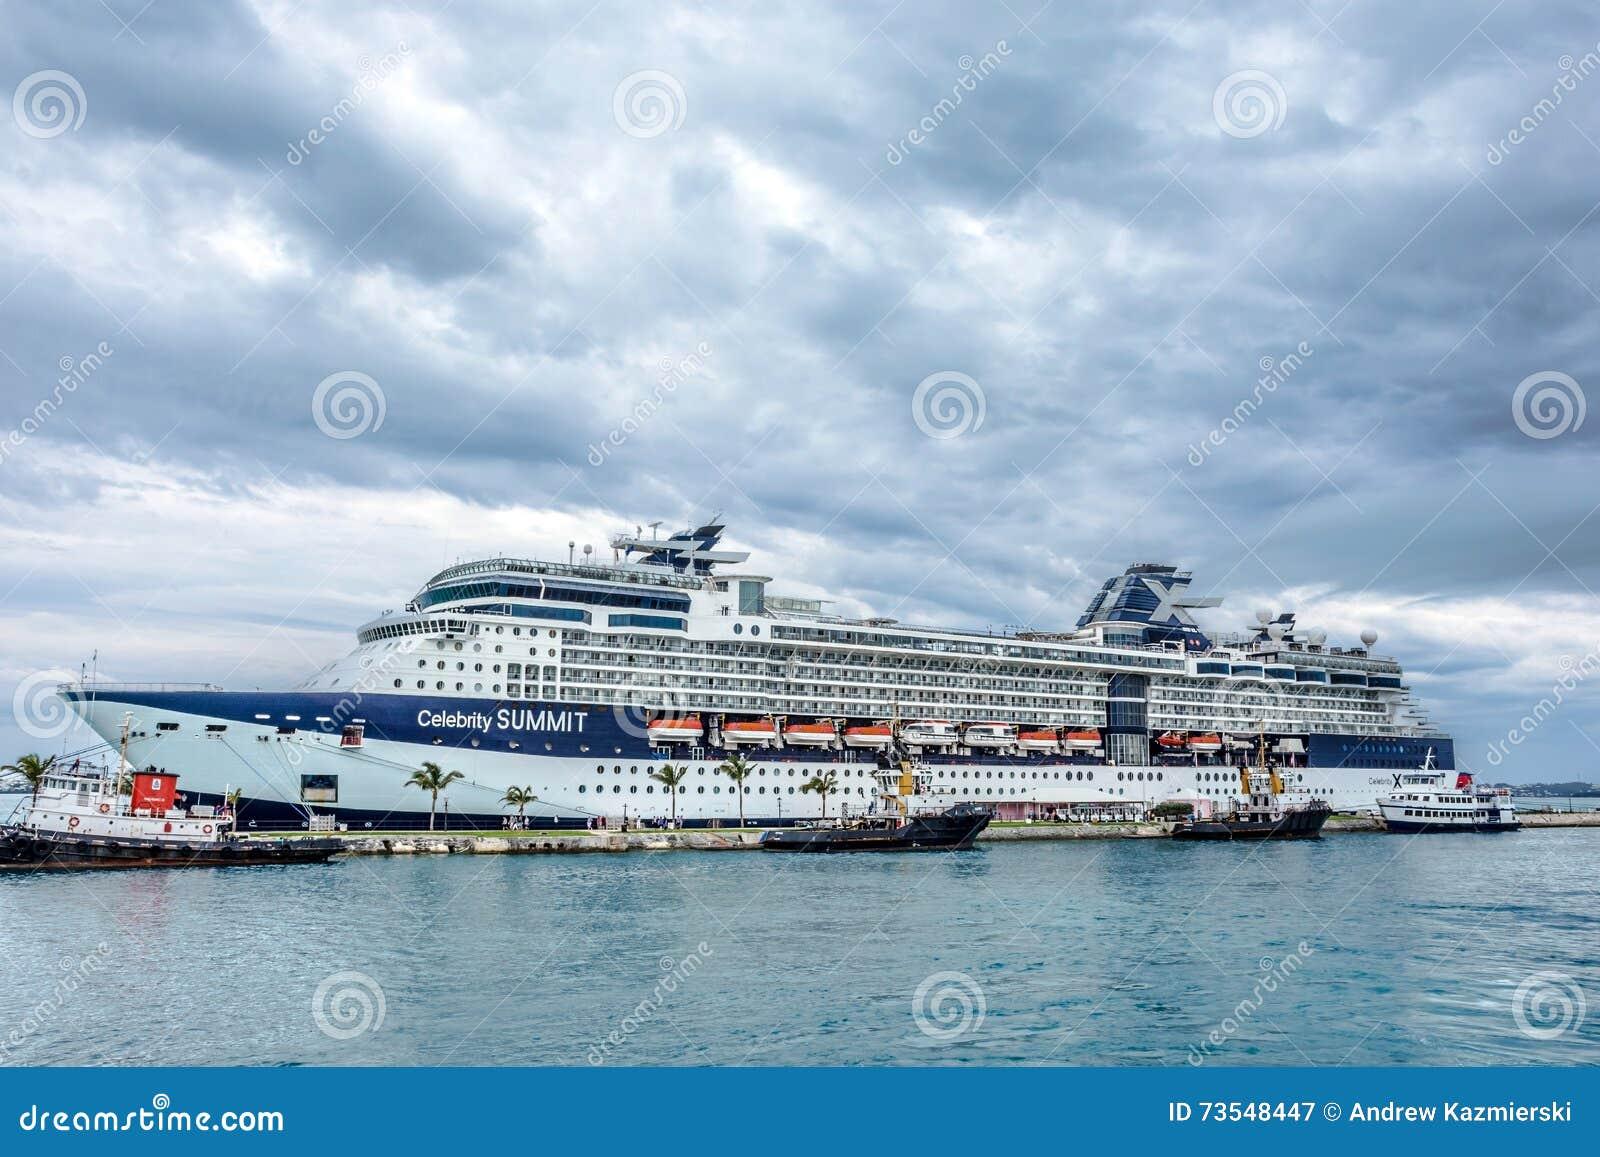 Celebrity Summit Cruise - Bermuda Attractions